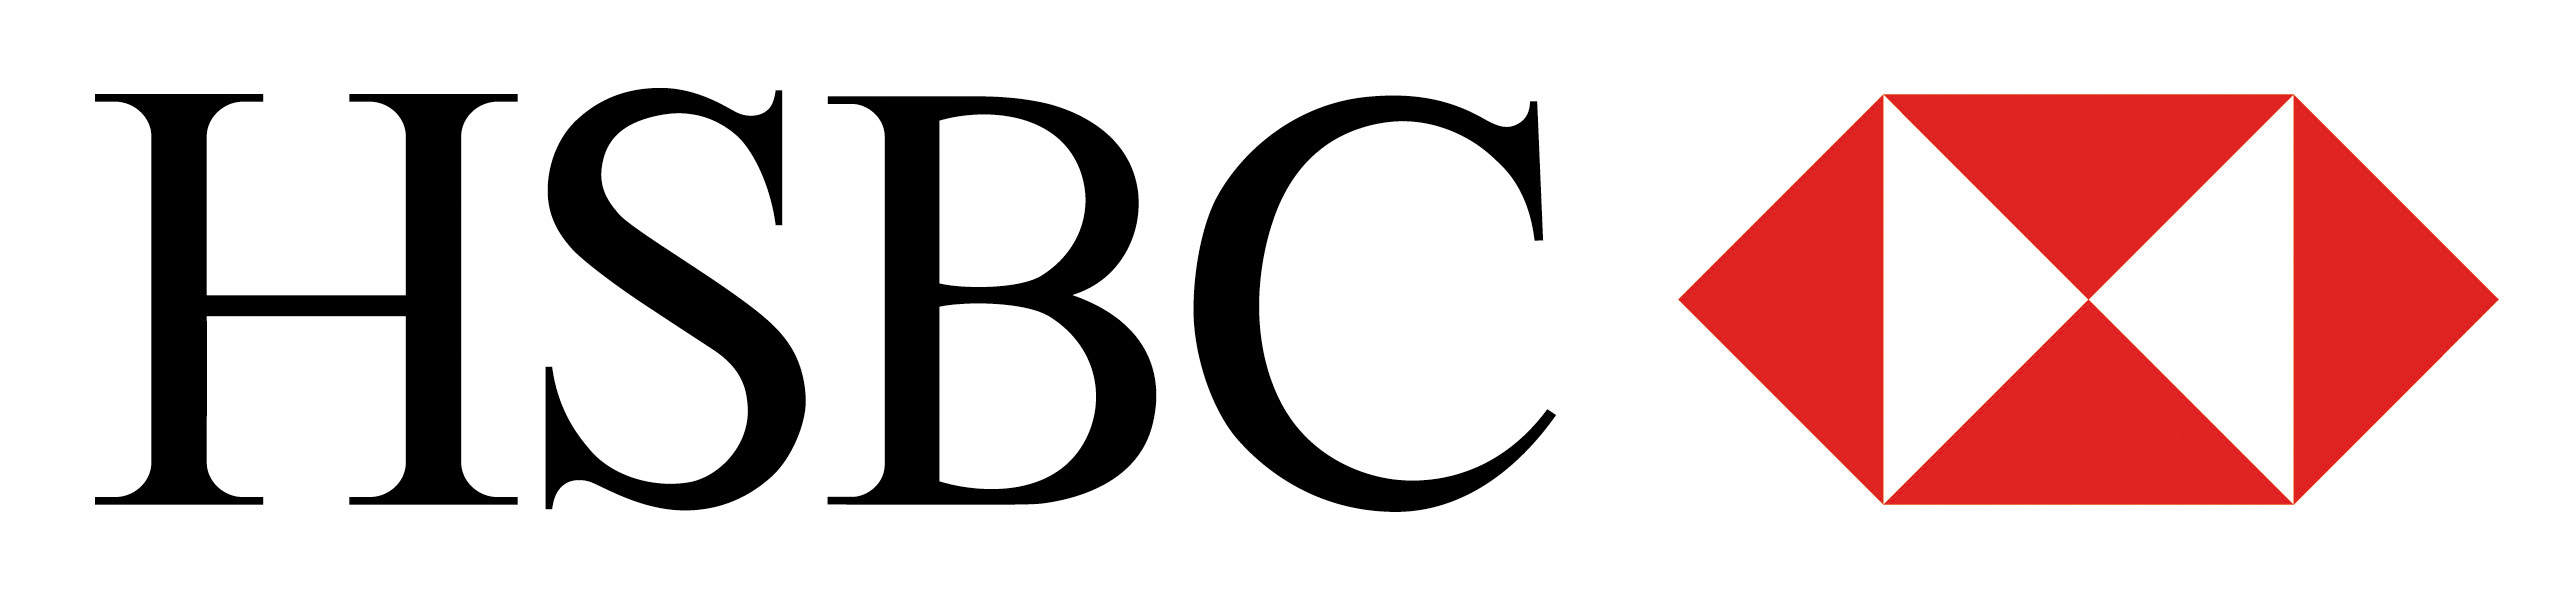 HSBC Holdings plc logo